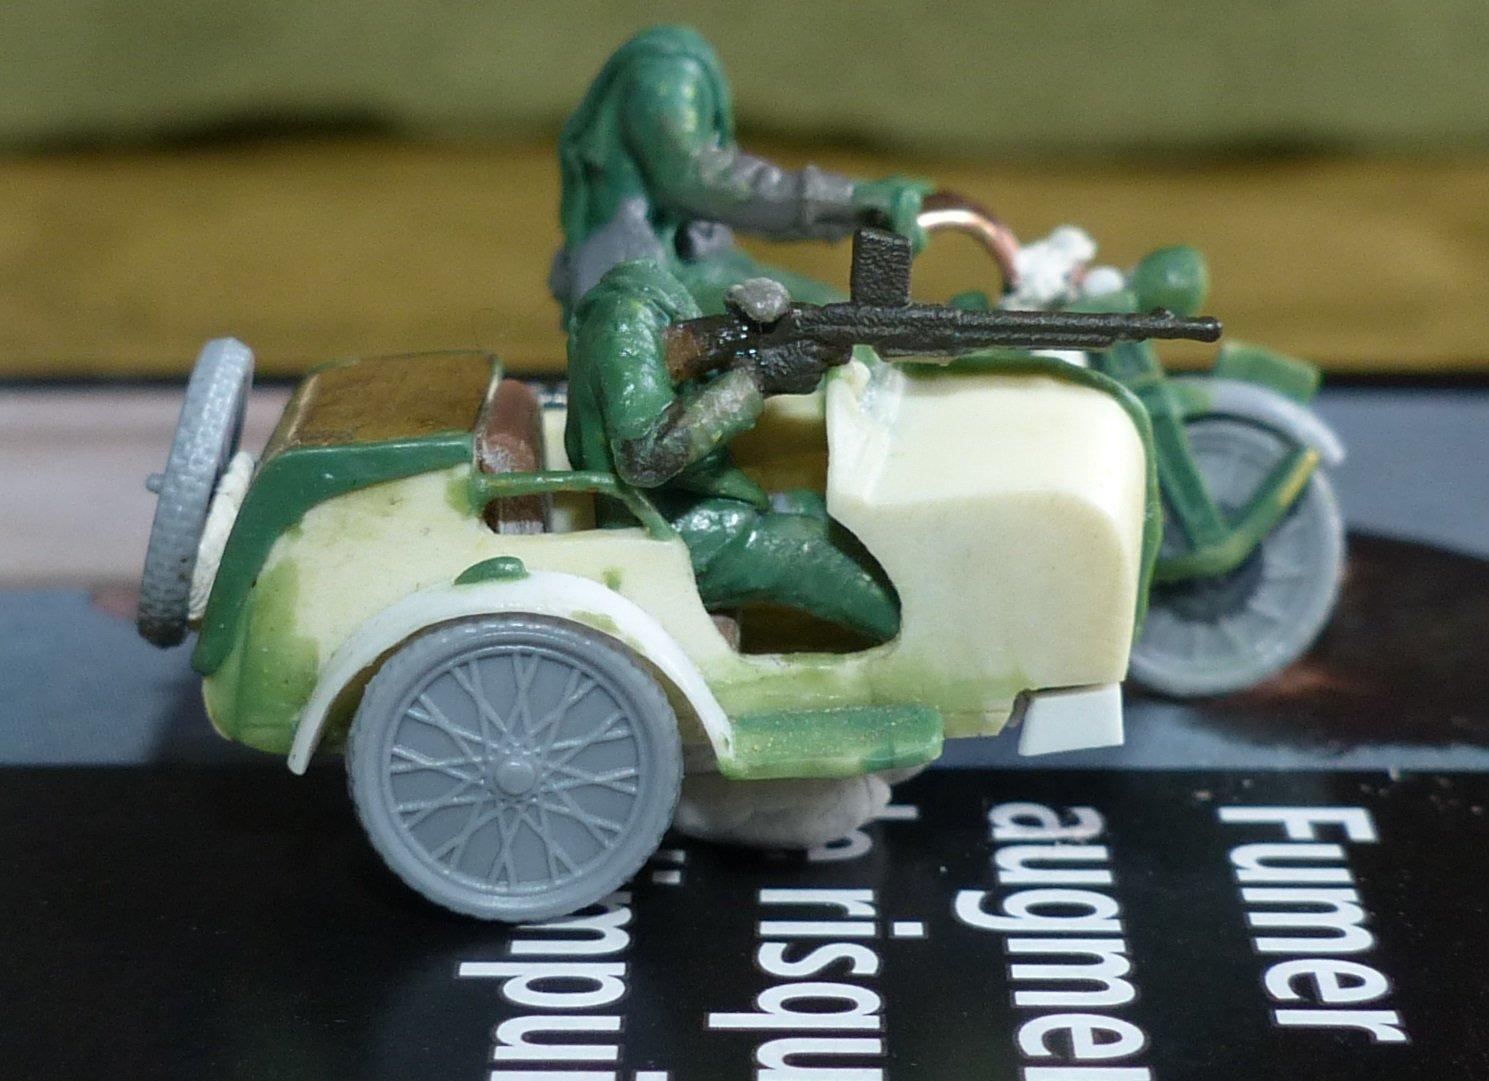 projet side car 1/72 gnome rhône retrokit france 210101115355989093